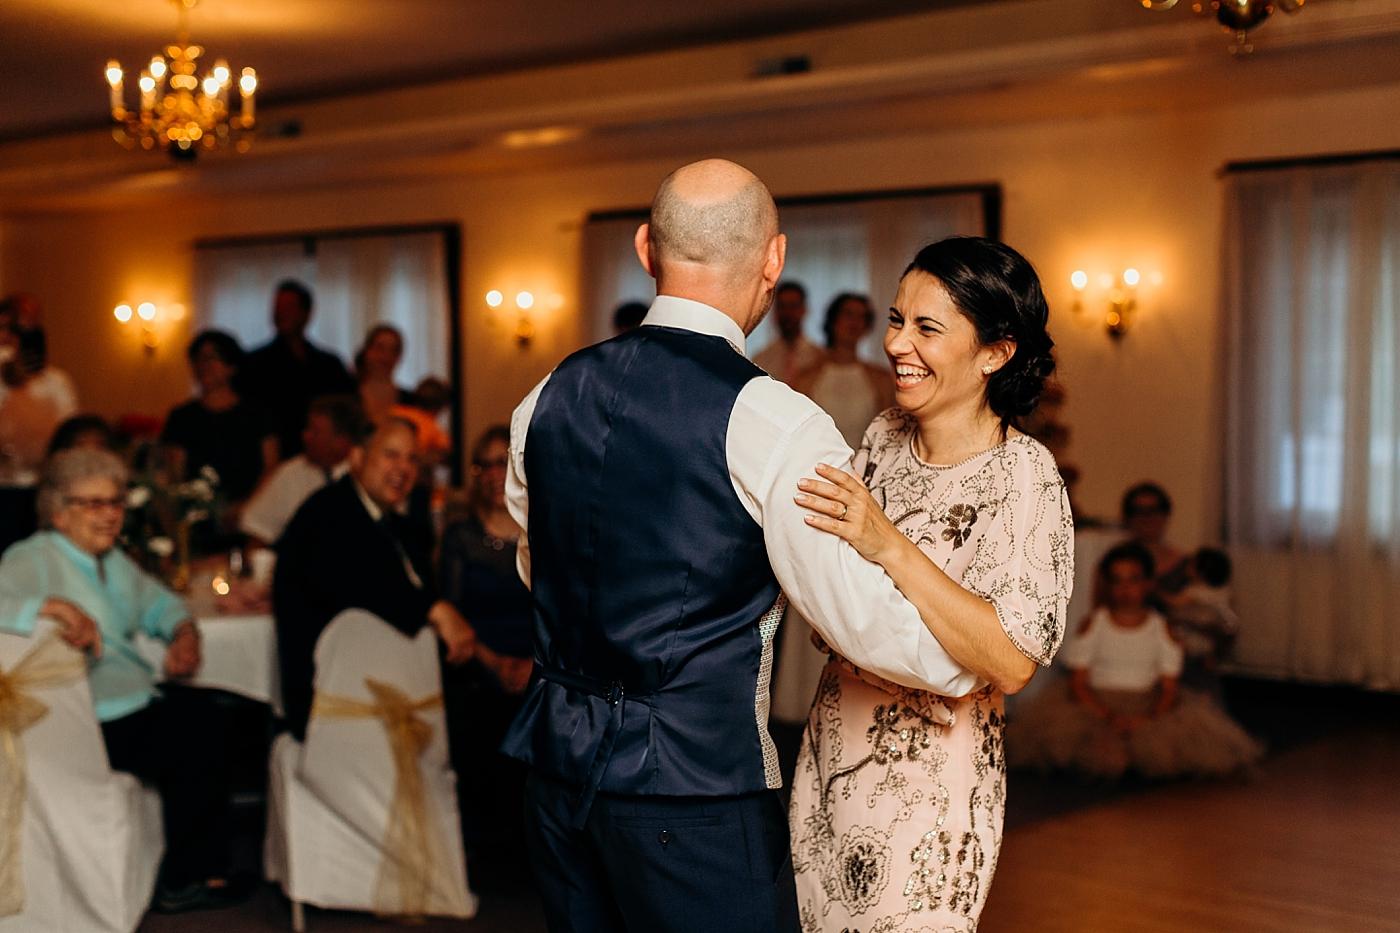 Chateau-Michelle-Wedding-Julia+JuanLuis_TheHeartlandersCo2018LA-399.jpg